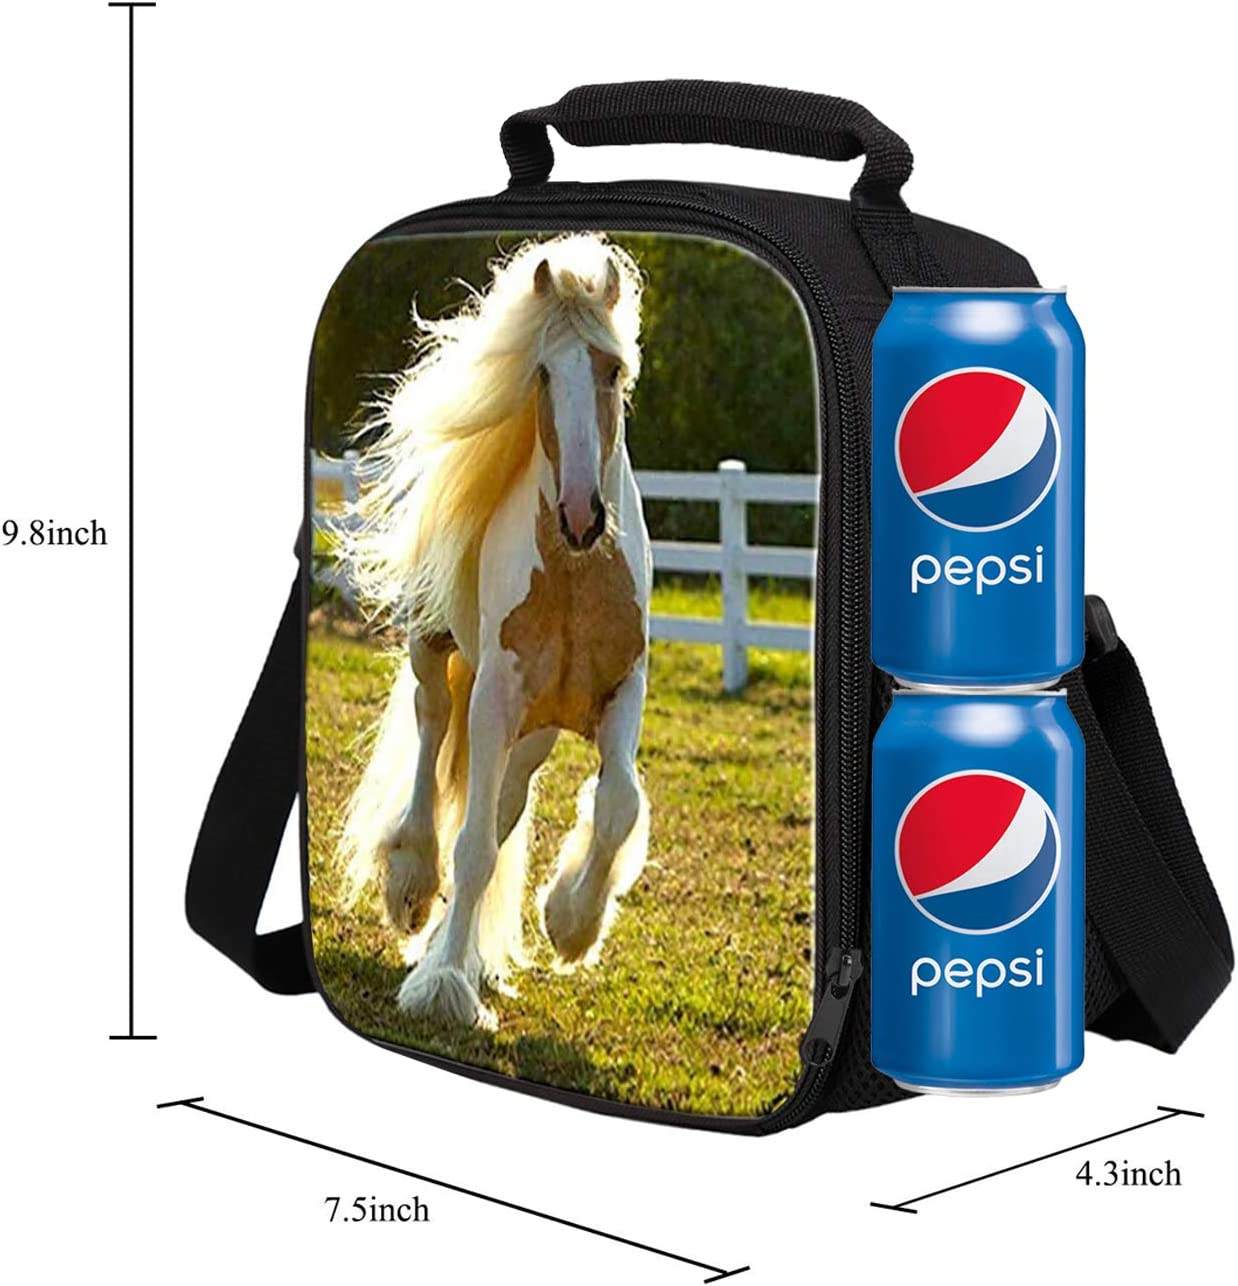 Children Travel Picnic Bag Insulated Tote Bag Lunch Box with Drink Bottle Holder with Shoulder Strap for Boys Girls 3D Print Blue Emoji Design